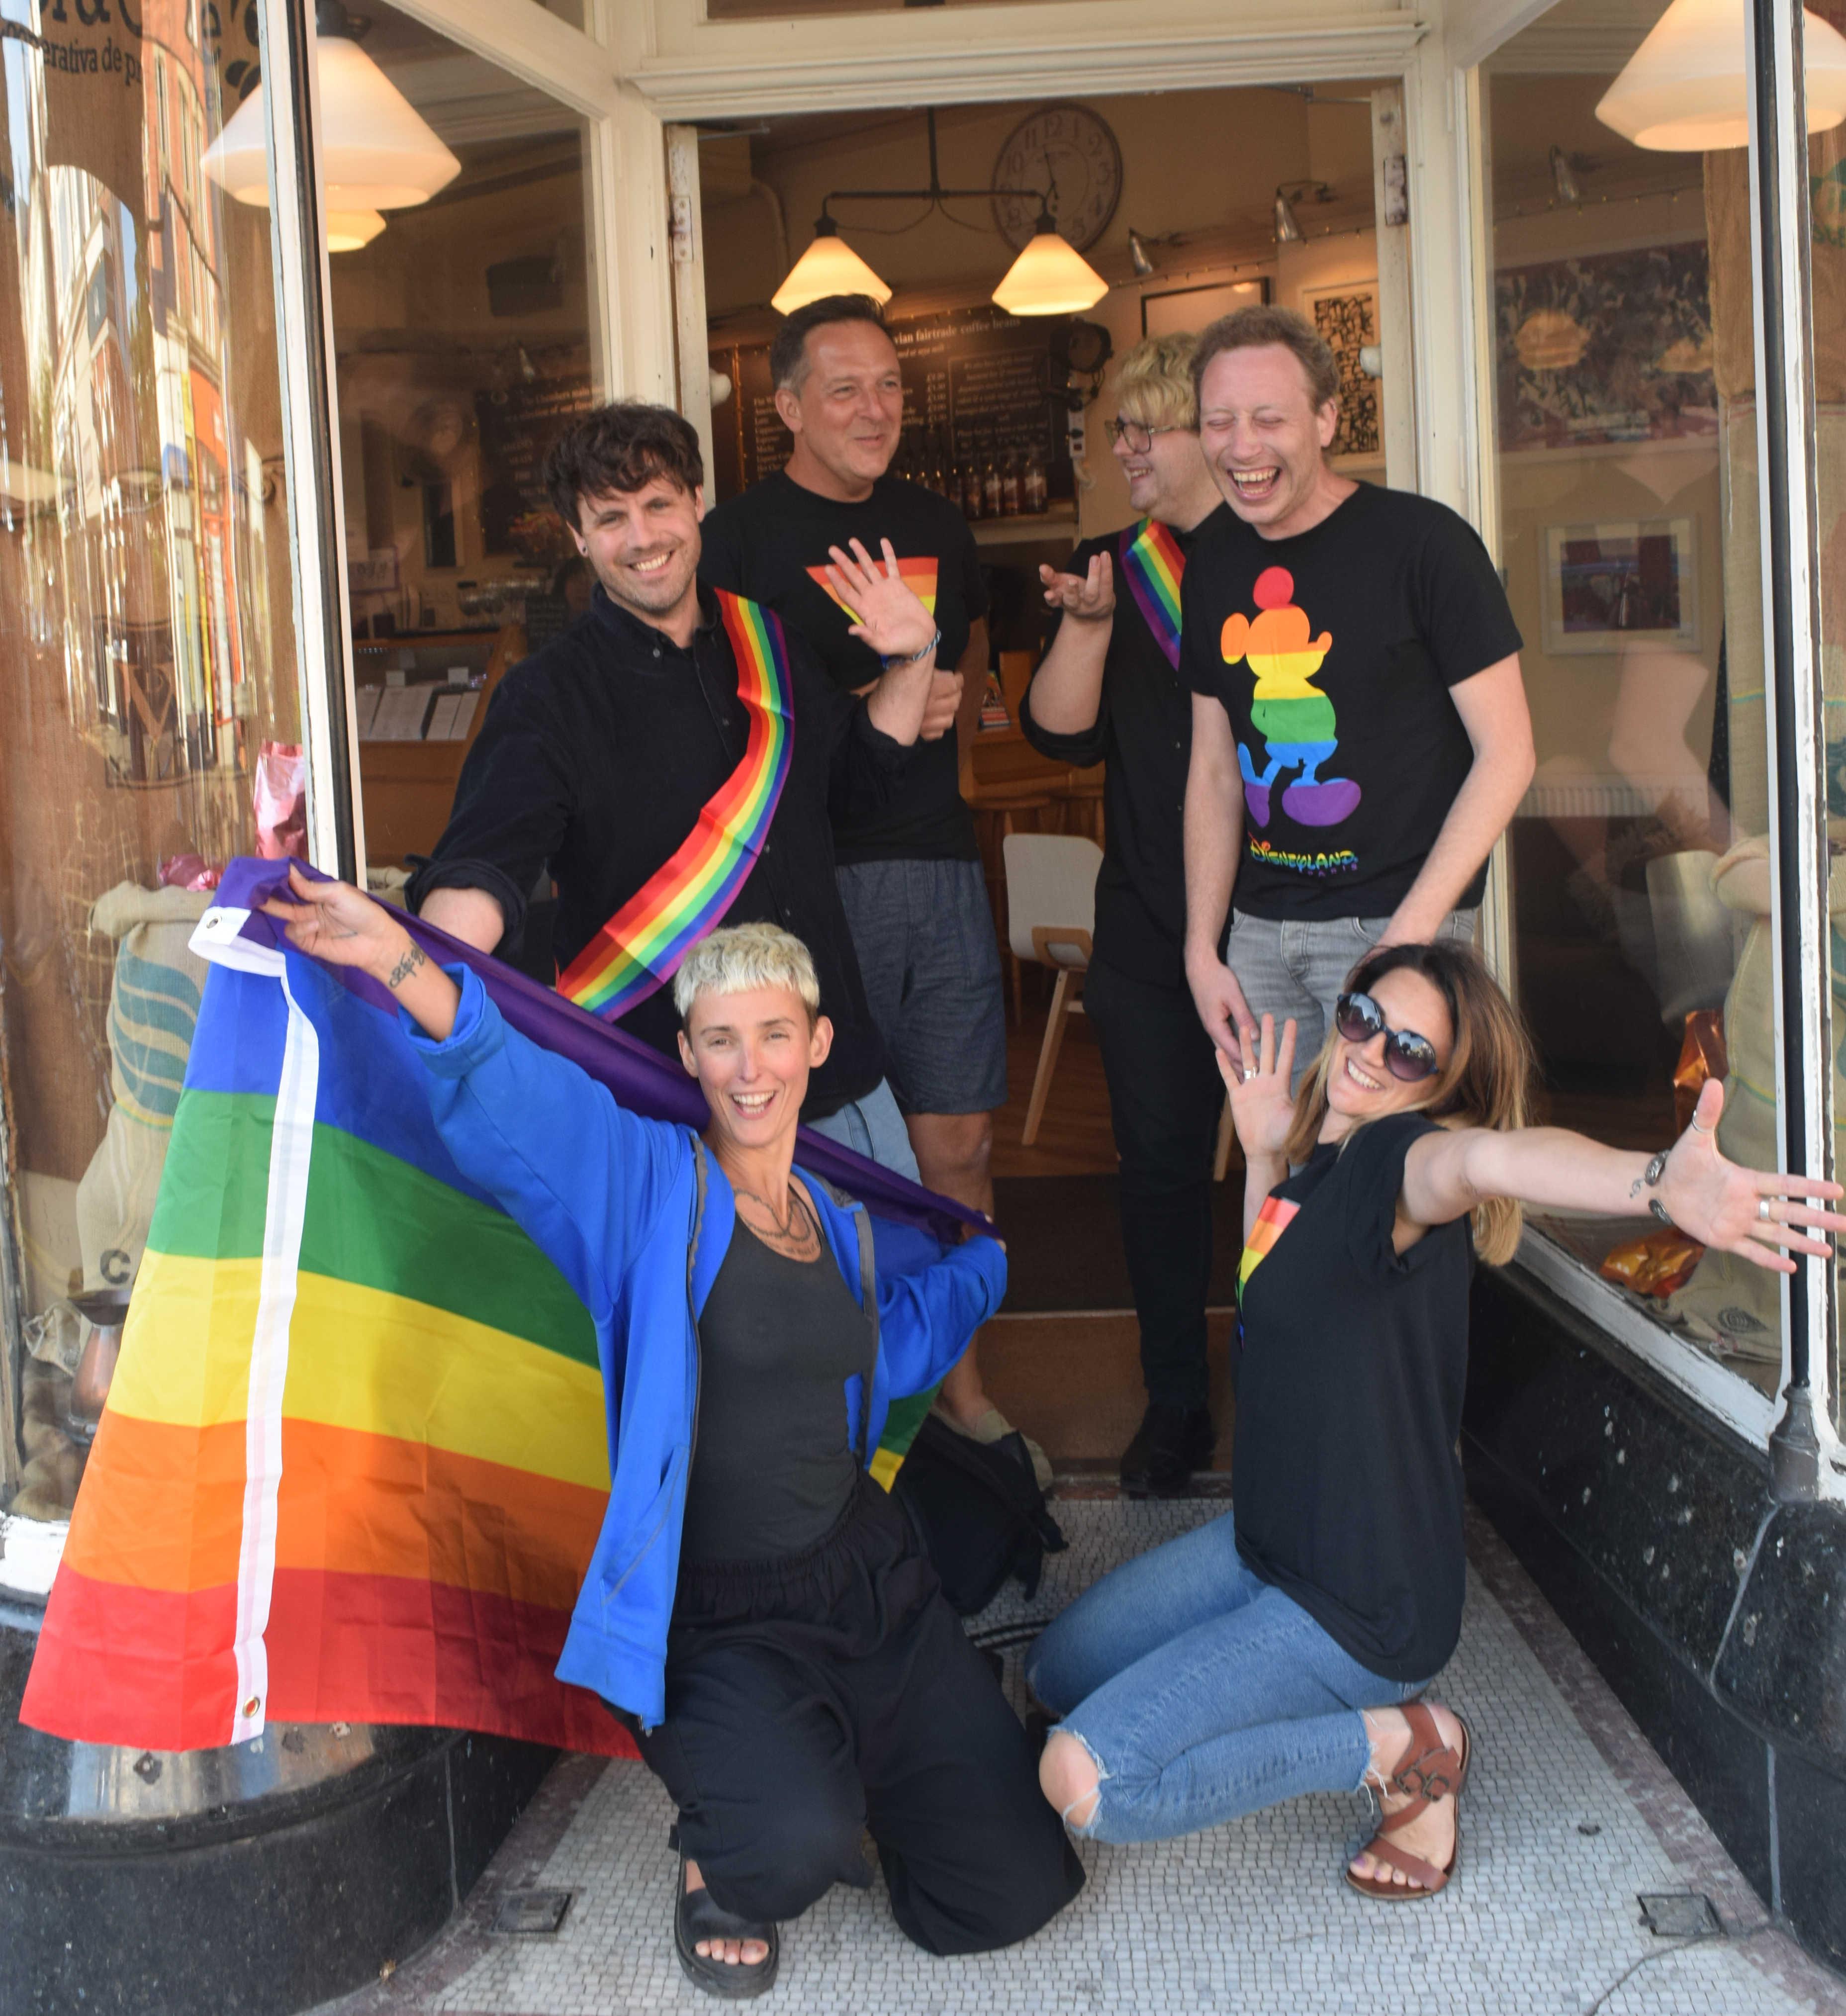 Folkestone Pride Team